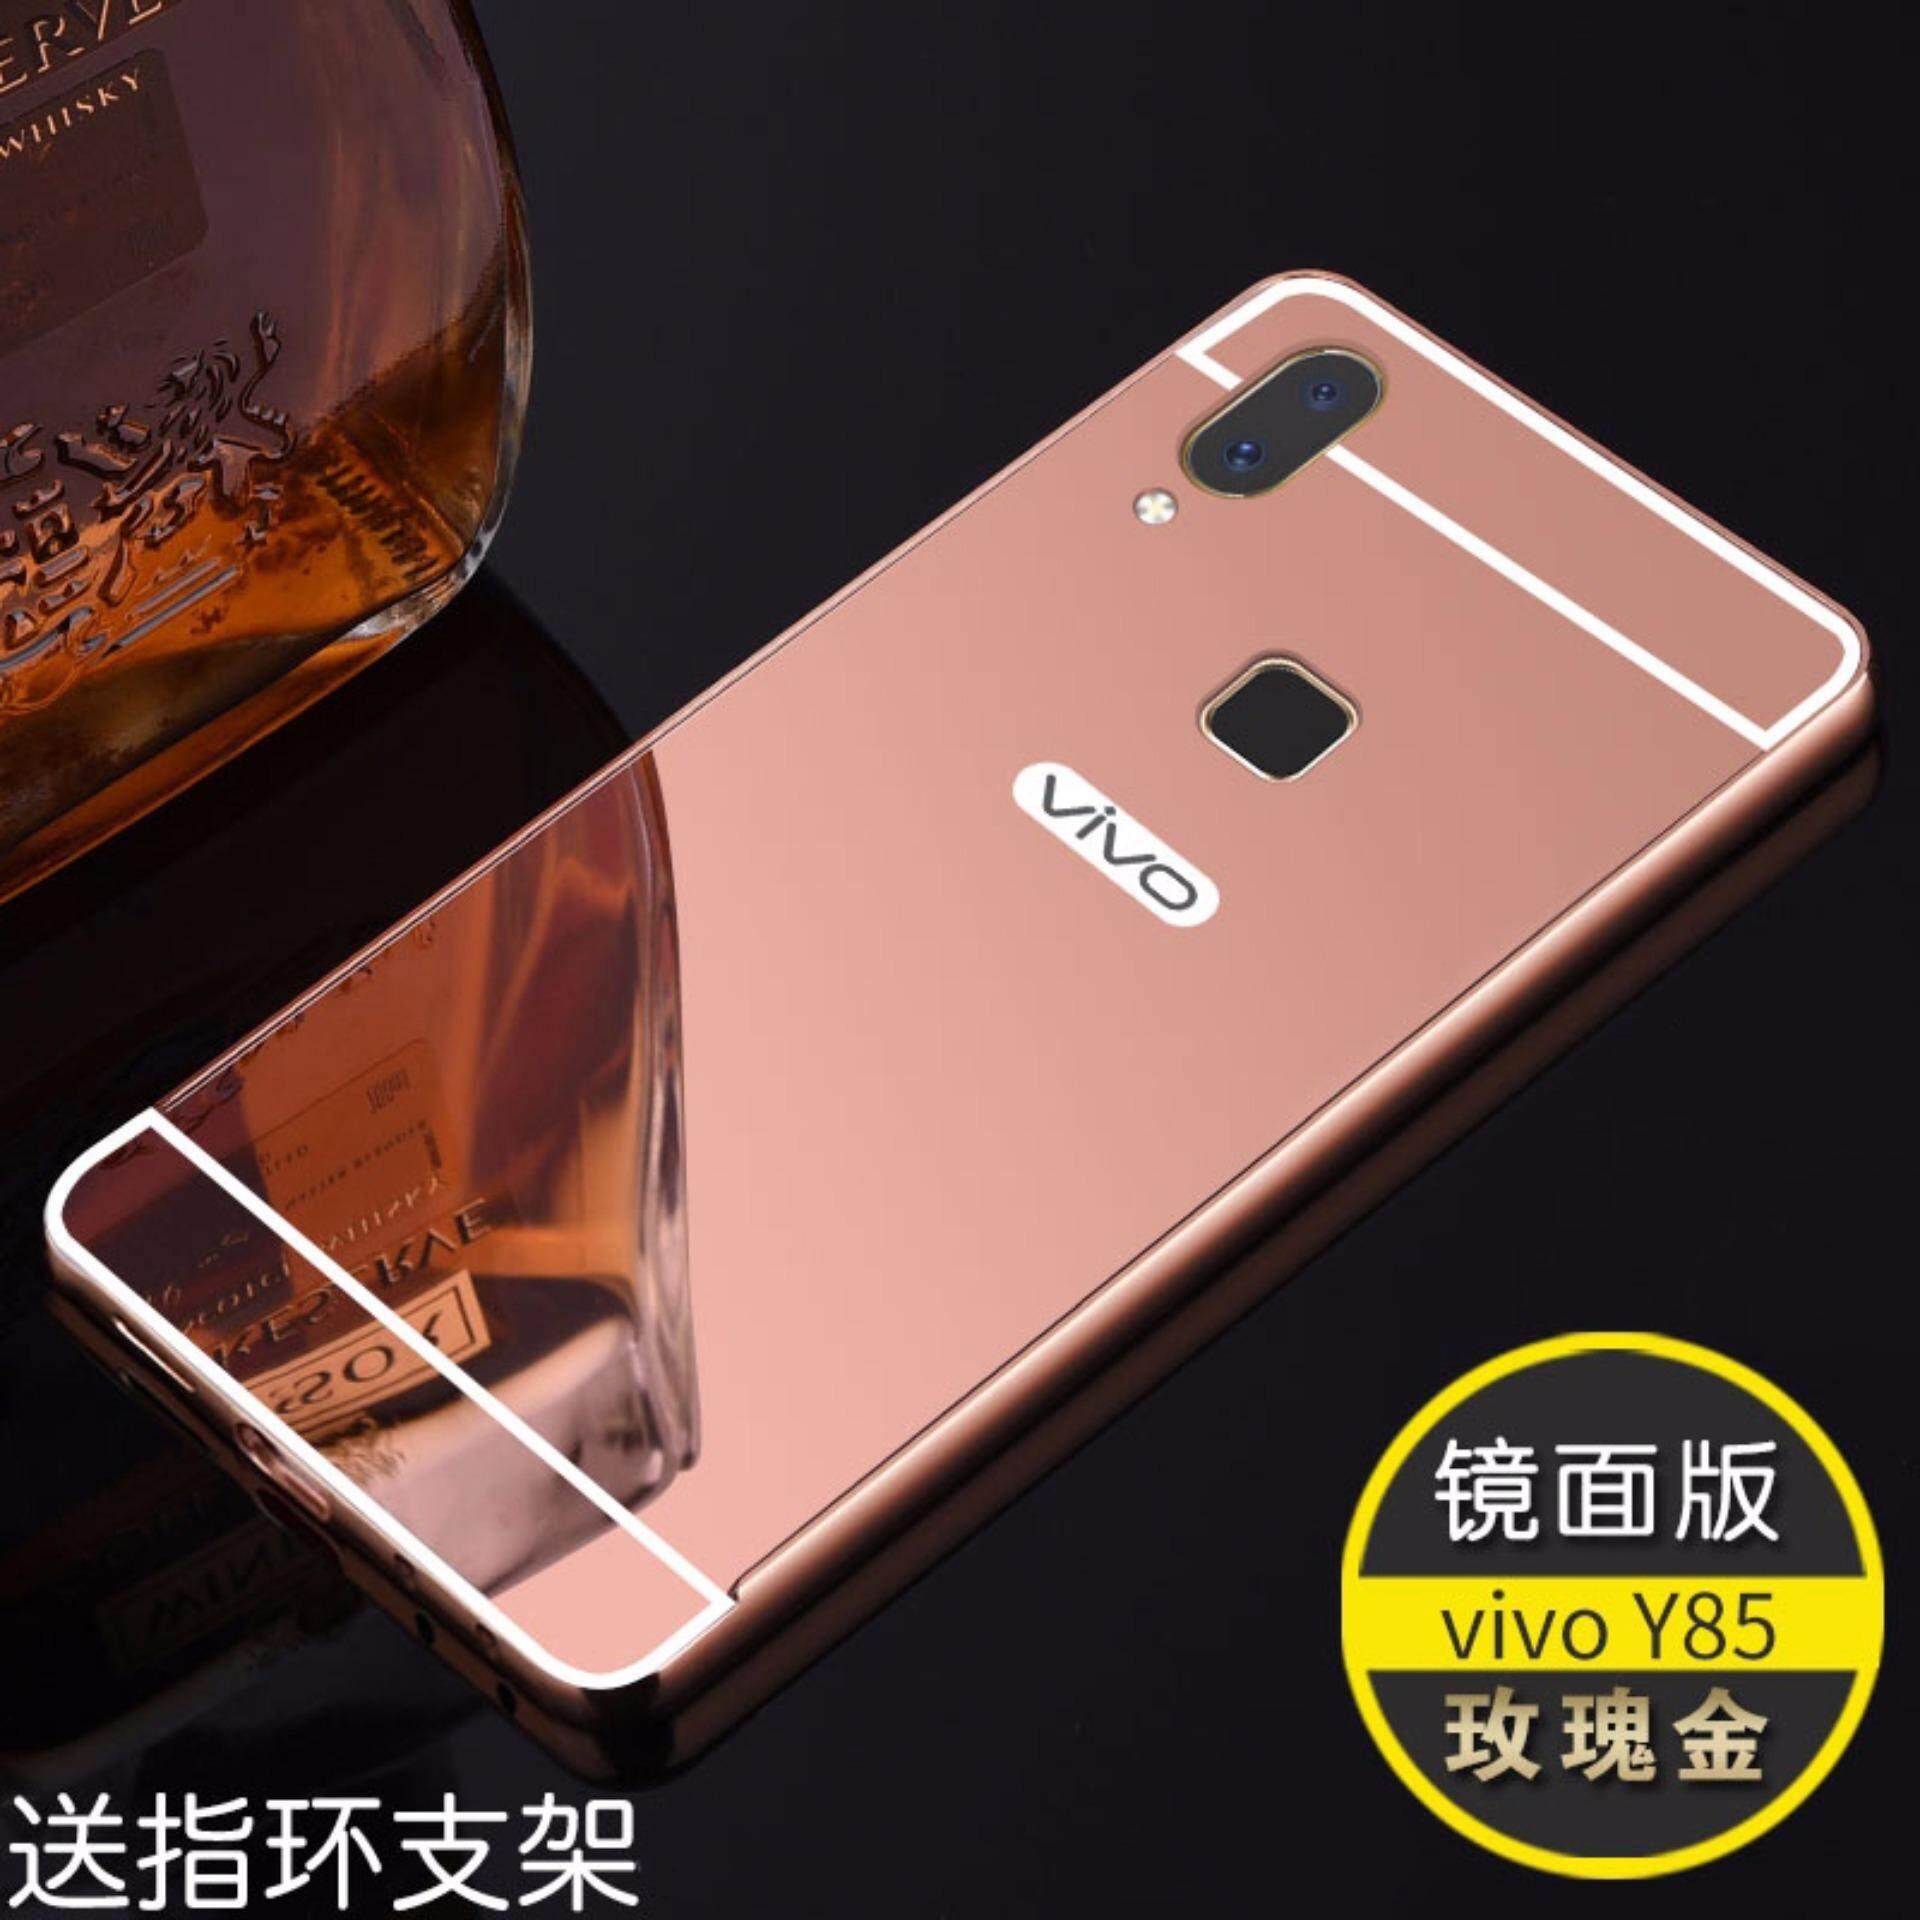 Soft Silicone Case Luxury 0.8mm Ultra Thin Back Cover For Samsung Galaxy C9 Pro /. Source · Metal Mirror Border Back Case Cove For Vivo V9/Vivo V9 ...